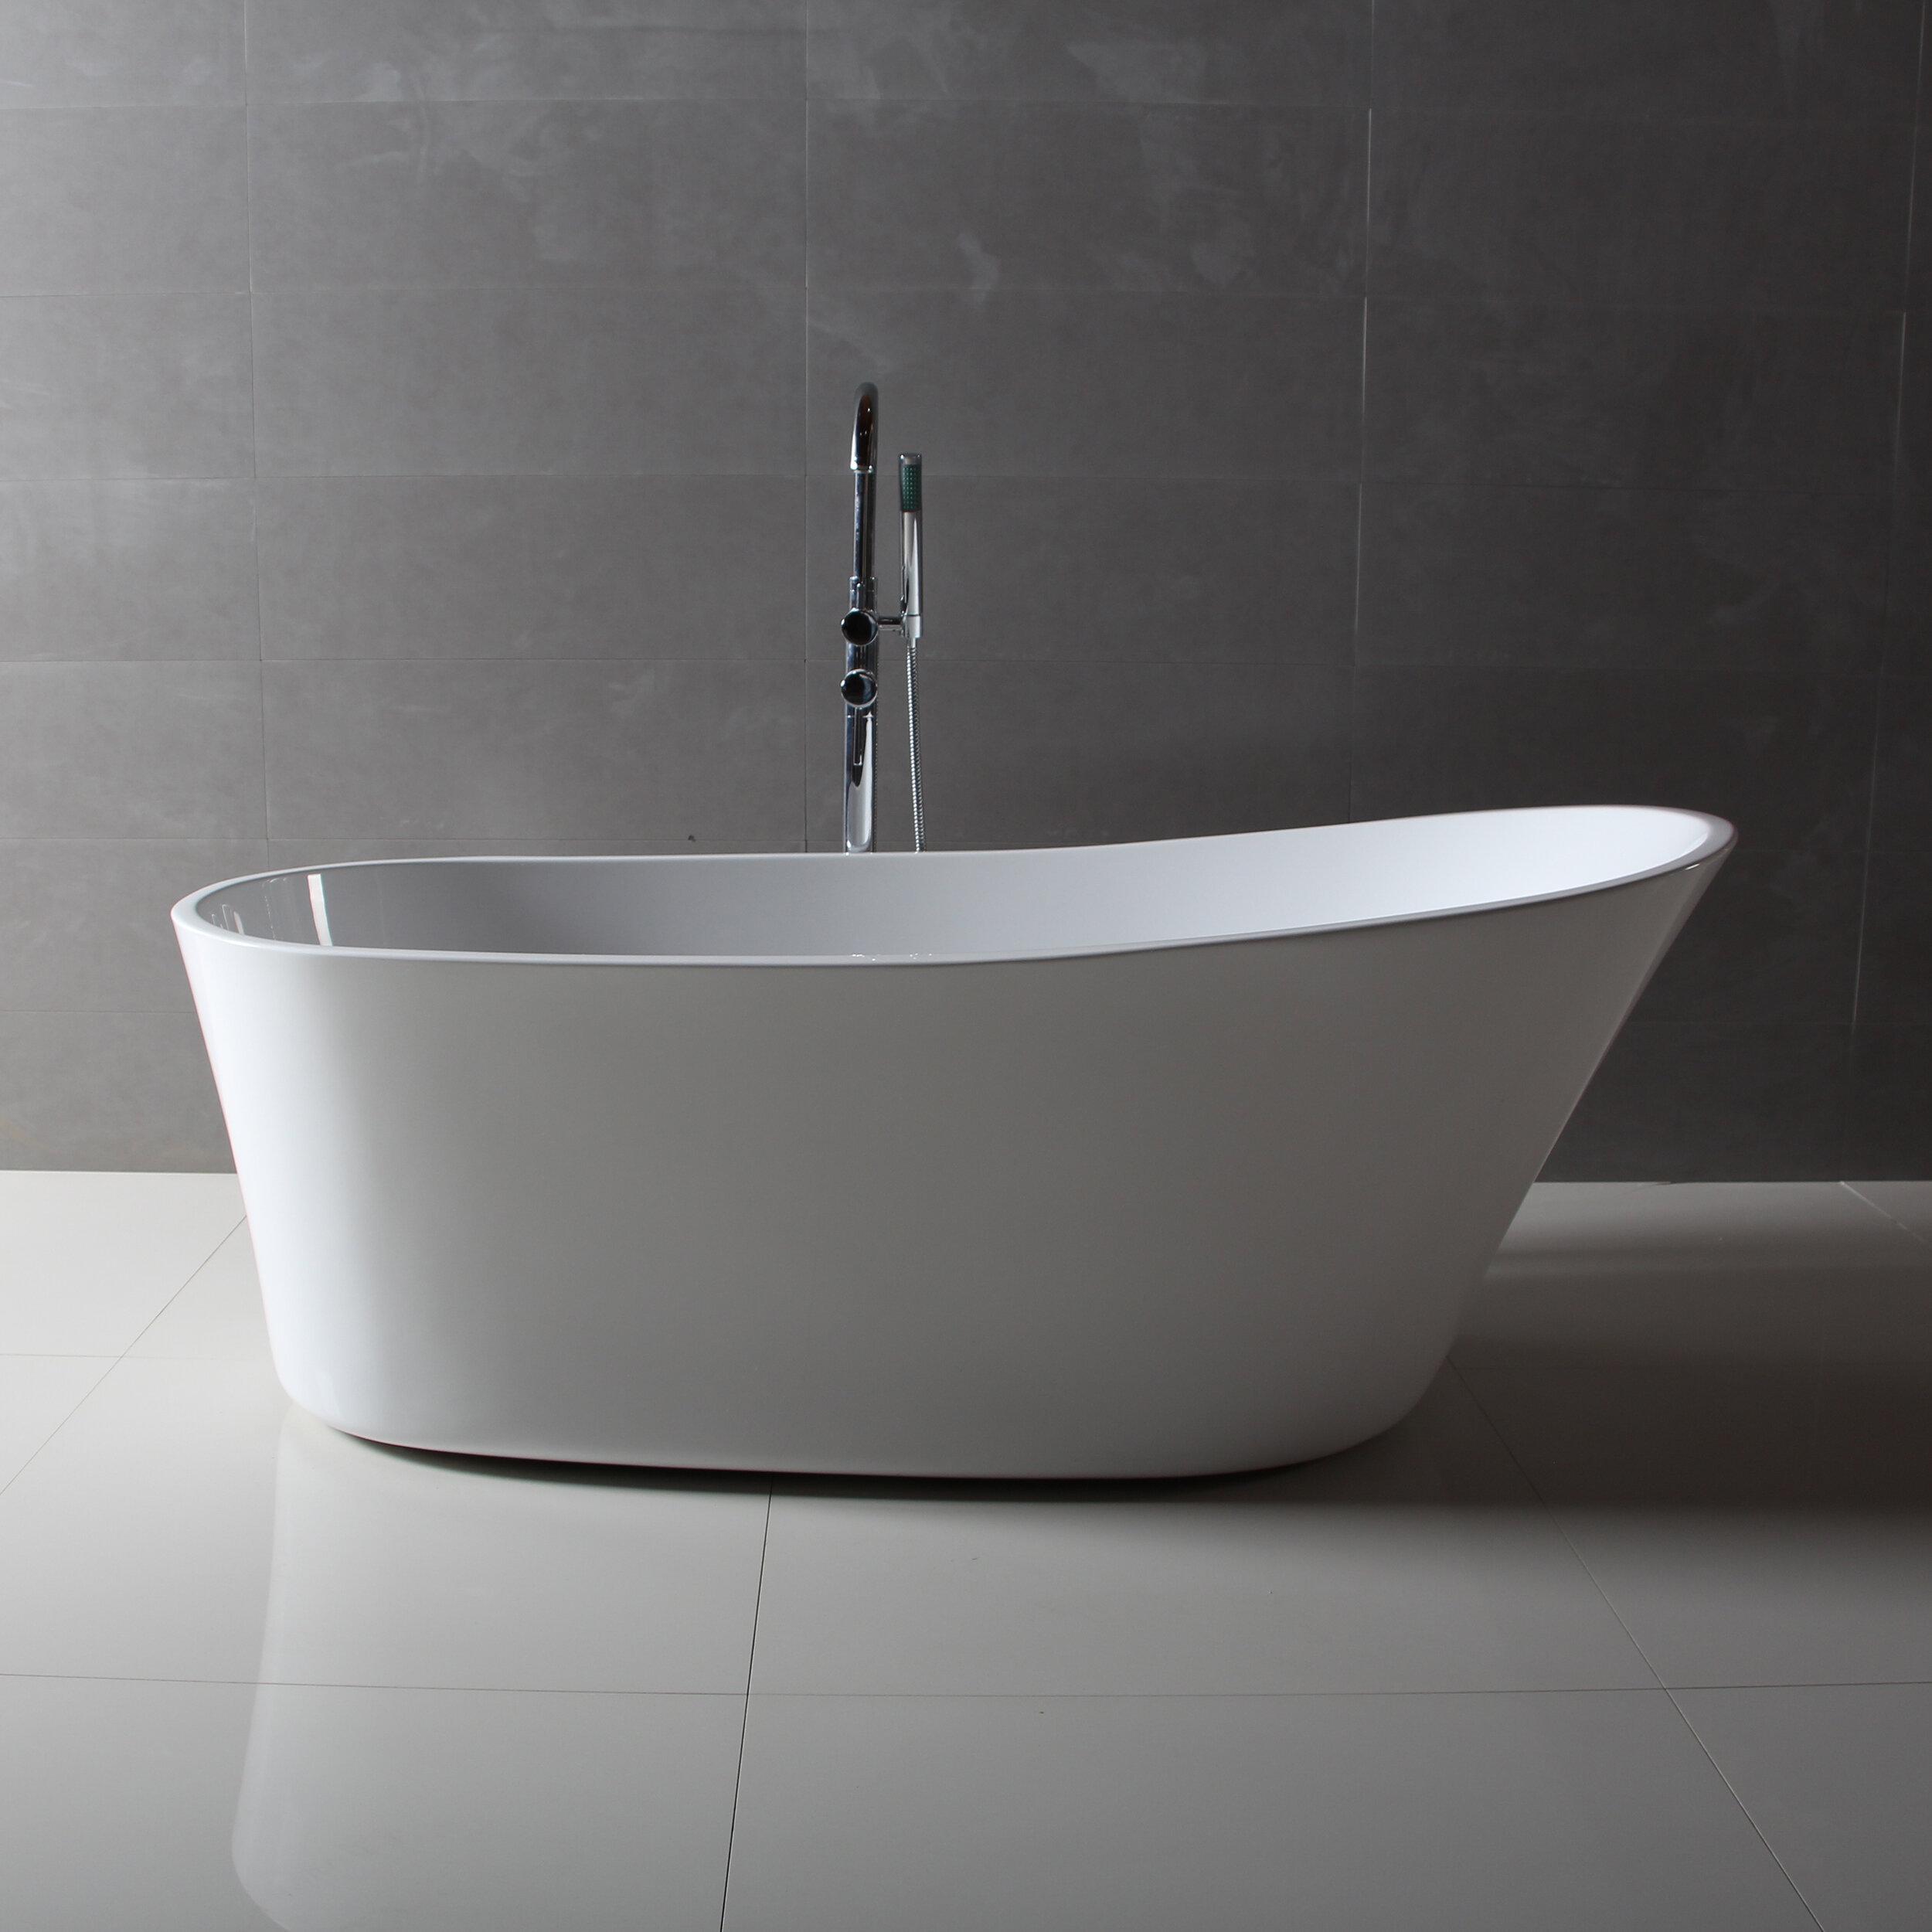 x freestanding wayfair bellaterra wyndham improvement bathtub soaking bathtubs home pdx bologna